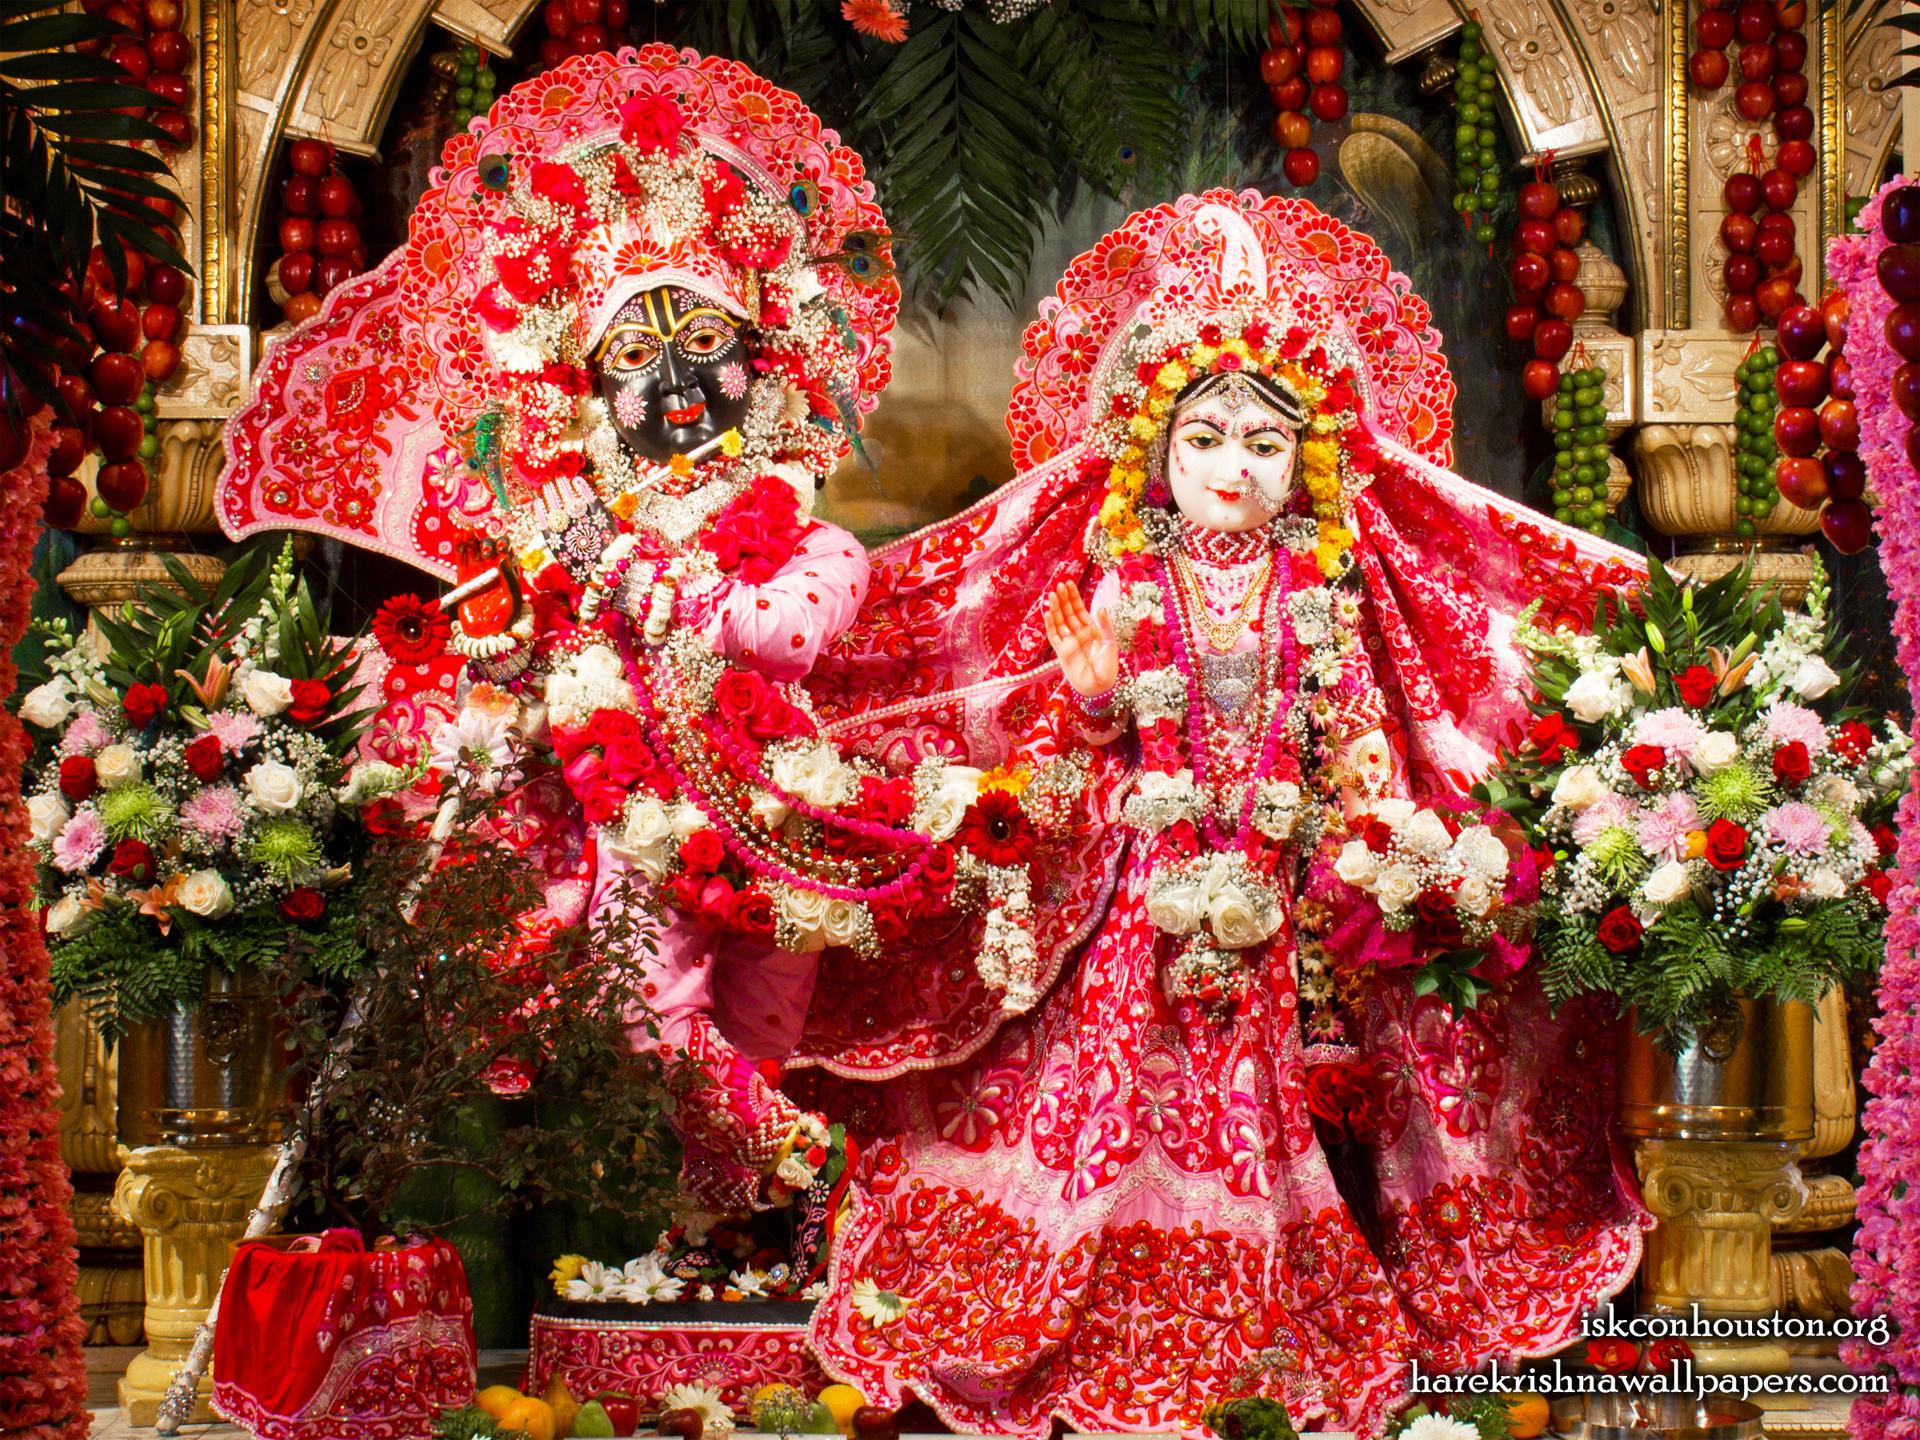 Sri Sri Radha Nilamadhava Wallpaper (011) Size 1920x1440 Download